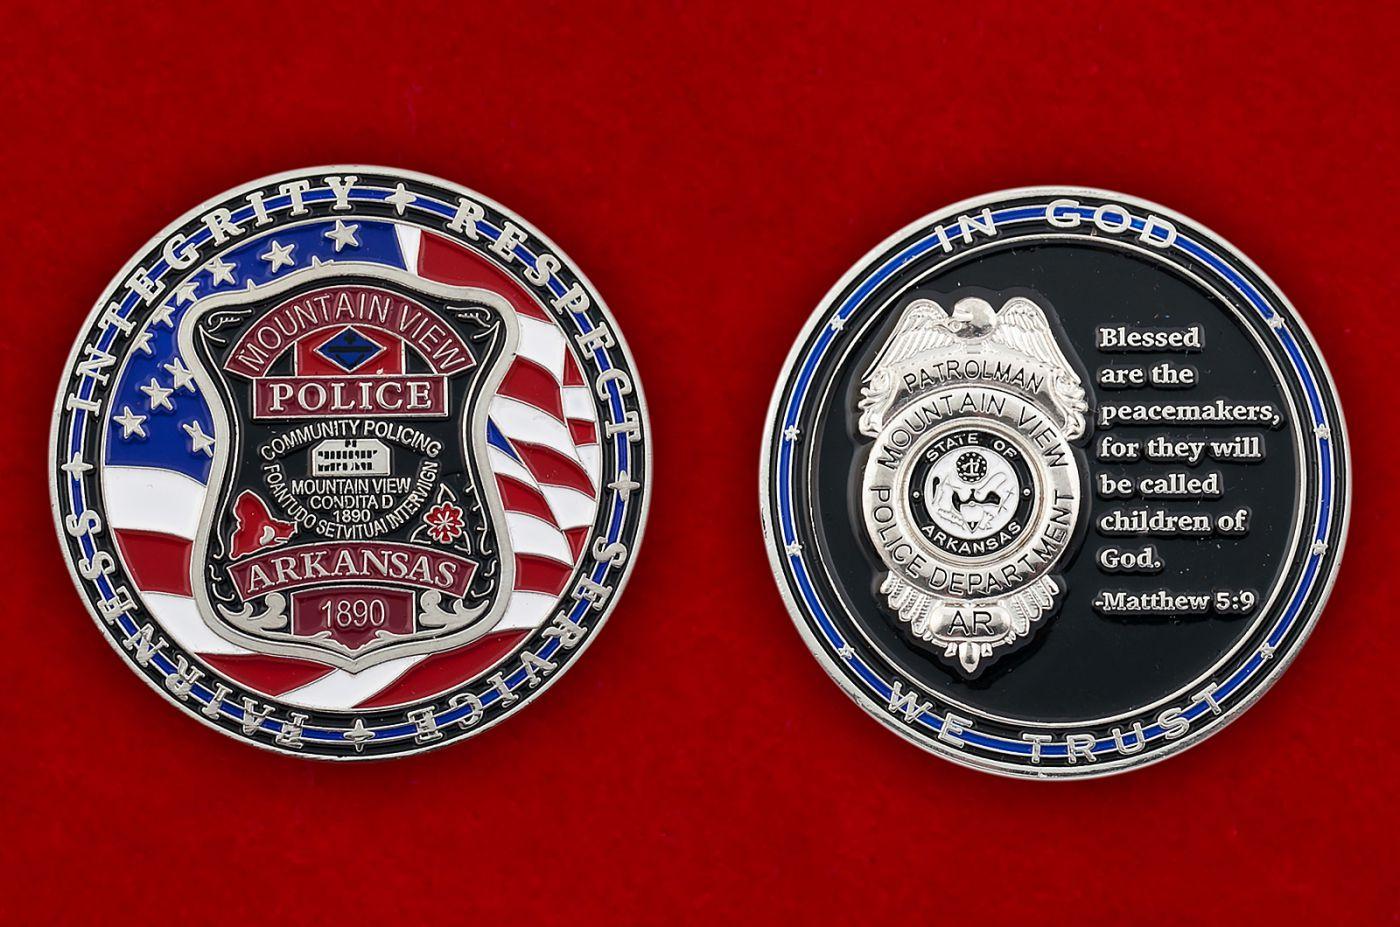 Челлендж коин полиции Маунтин-Вью, штат Арканзас - аверс и реверс